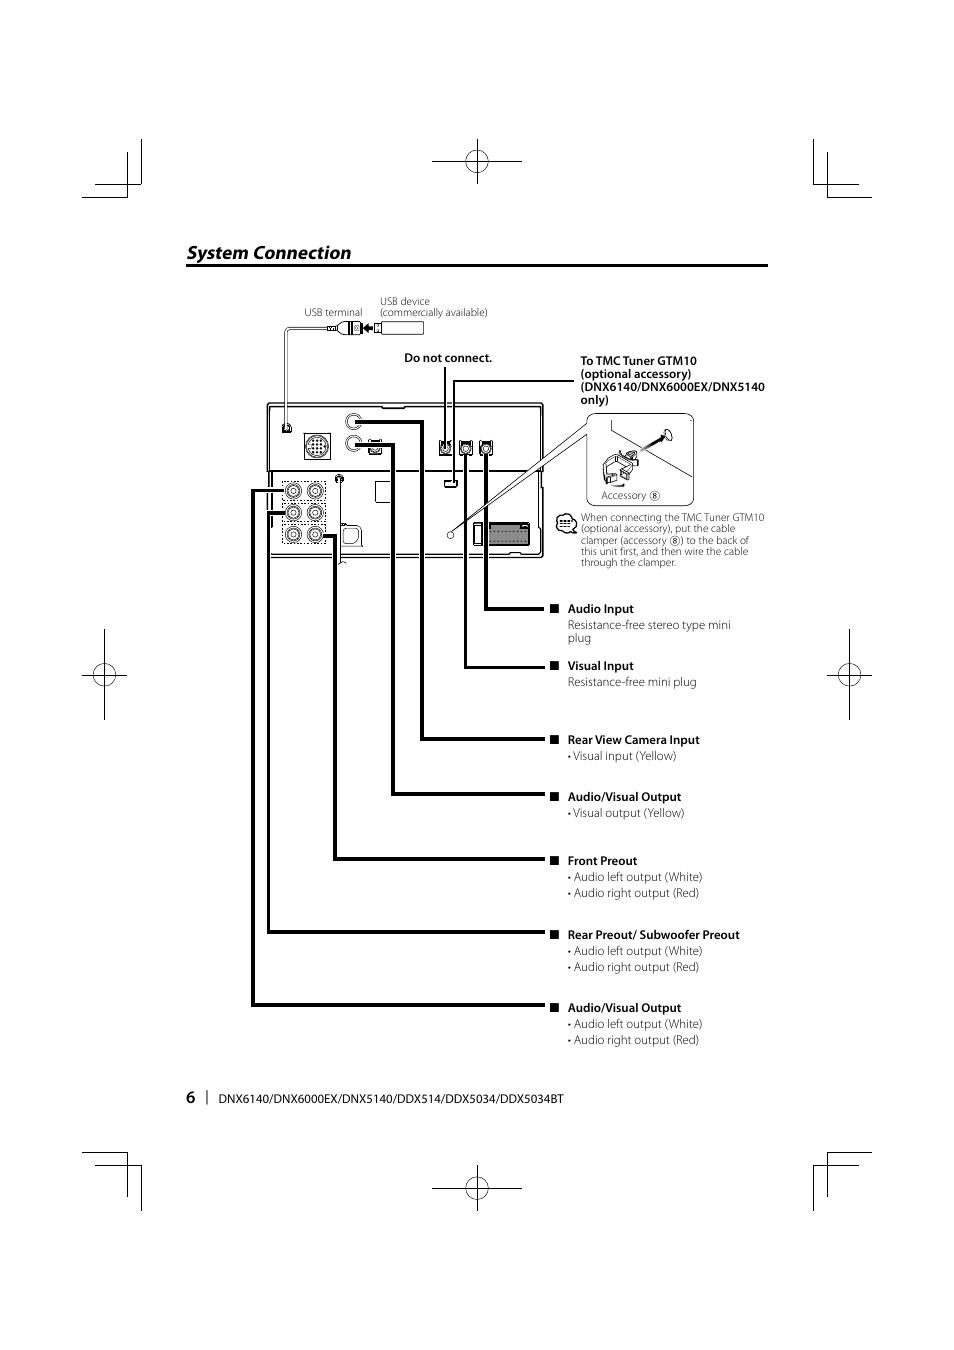 system connection kenwood ddx5034 user manual page 6 32 rh manualsdir com kenwood dnx5140 installation manual Kenwood DNX5140 Update